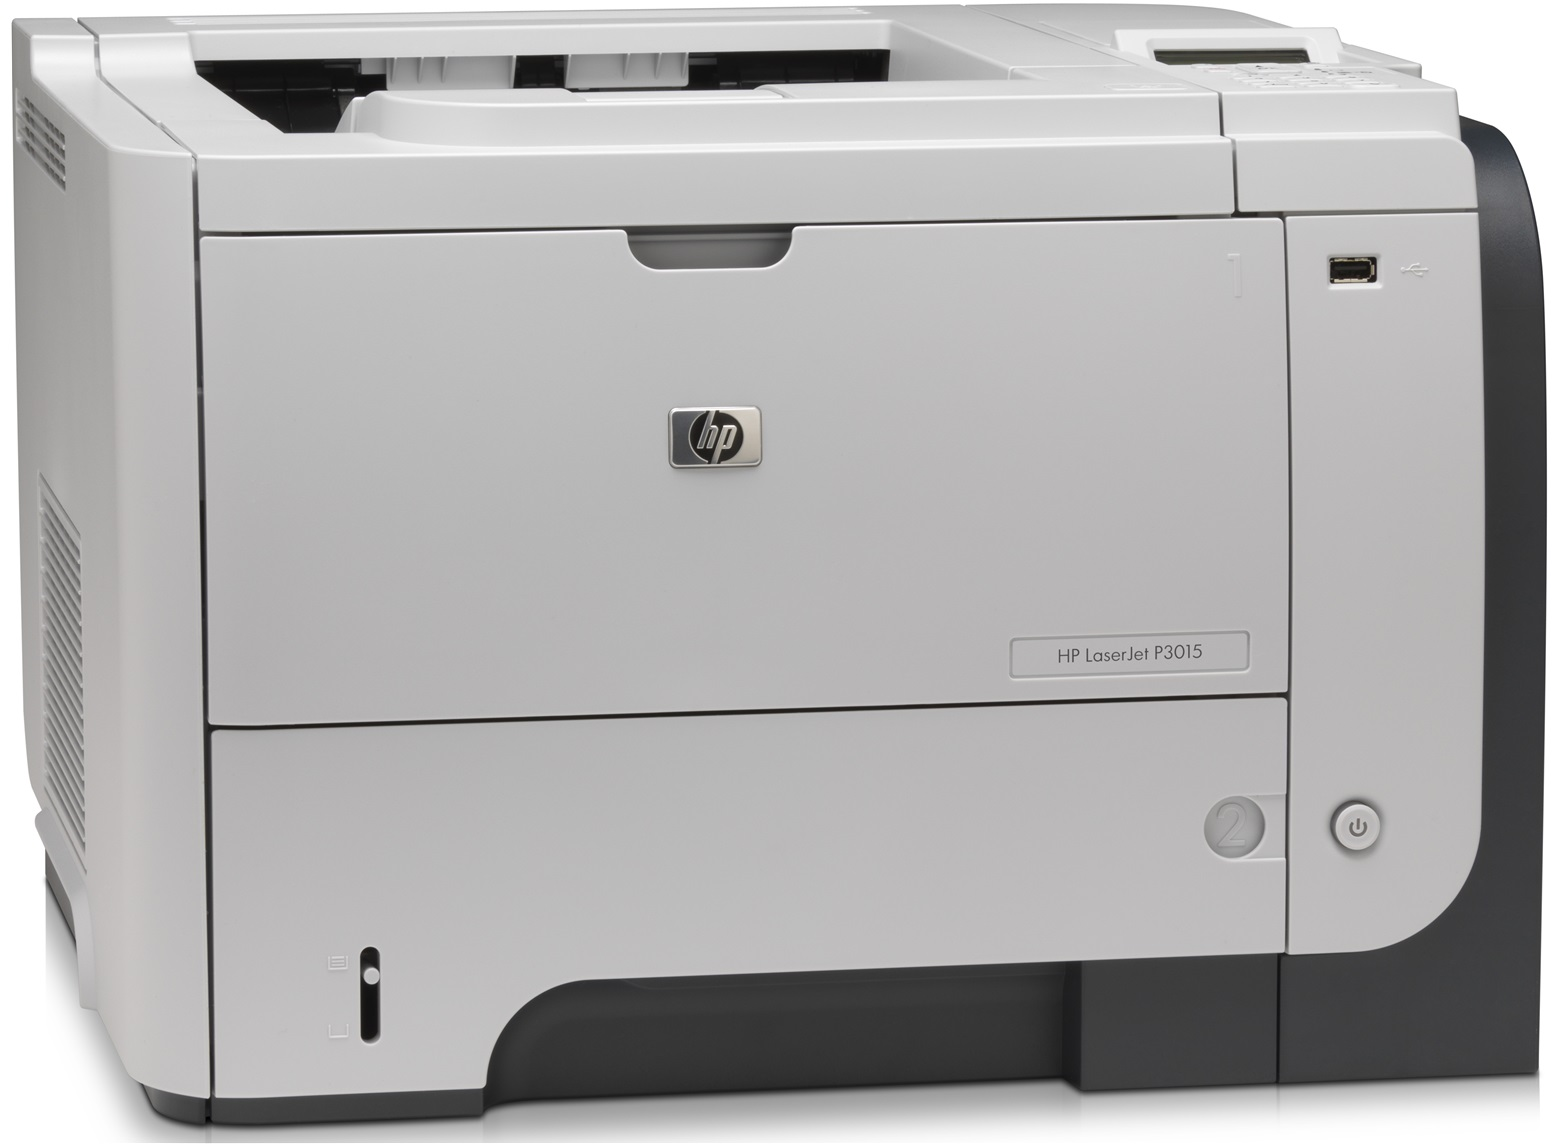 hp p3015n laserjet printer reconditioned copyfaxes. Black Bedroom Furniture Sets. Home Design Ideas